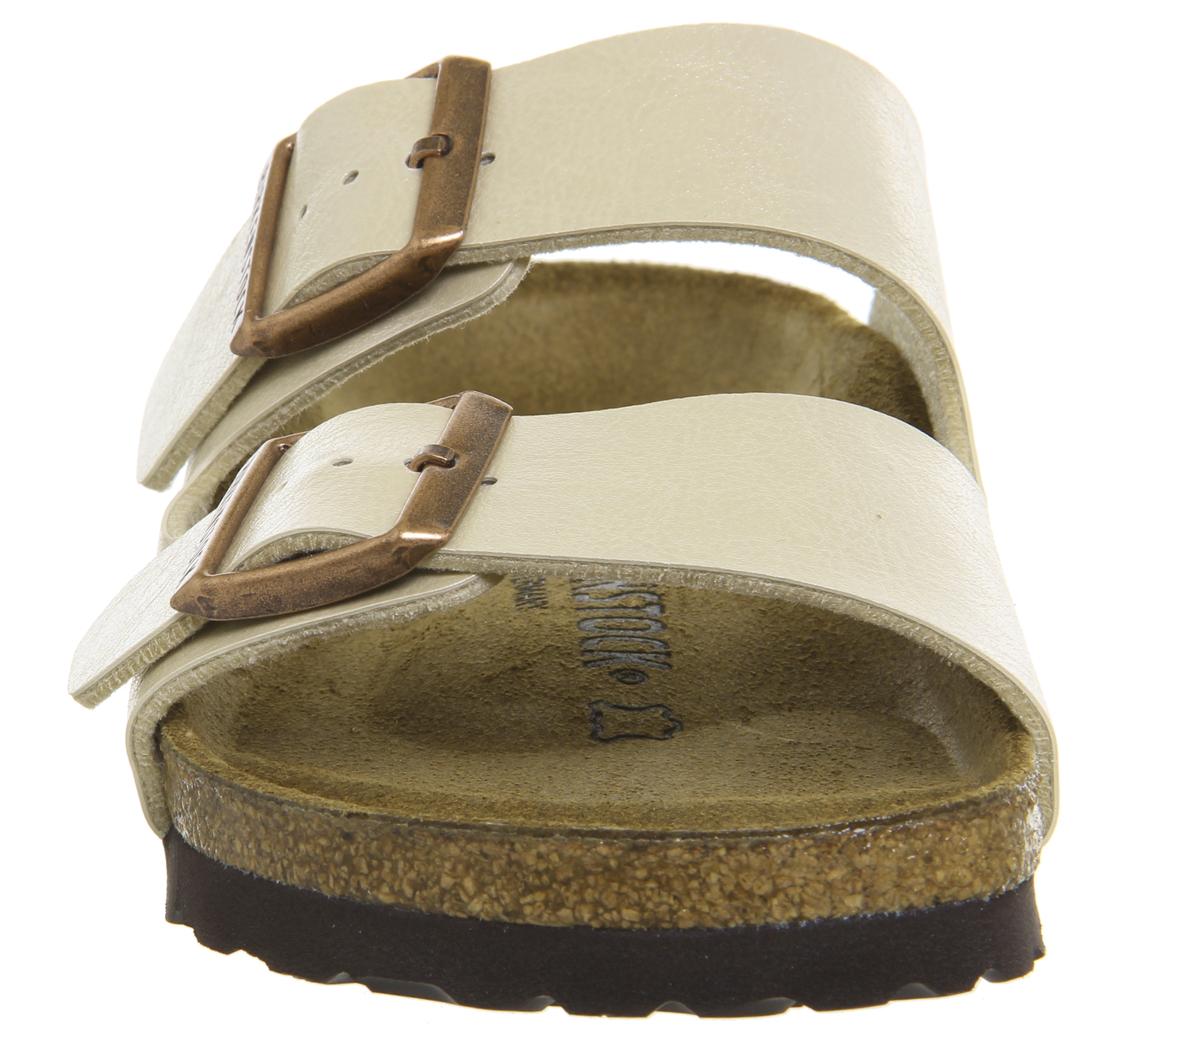 441e059db5e66 SENTINEL Womens Birkenstock Arizona due sandali PEARL grazioso sandali  bianchi